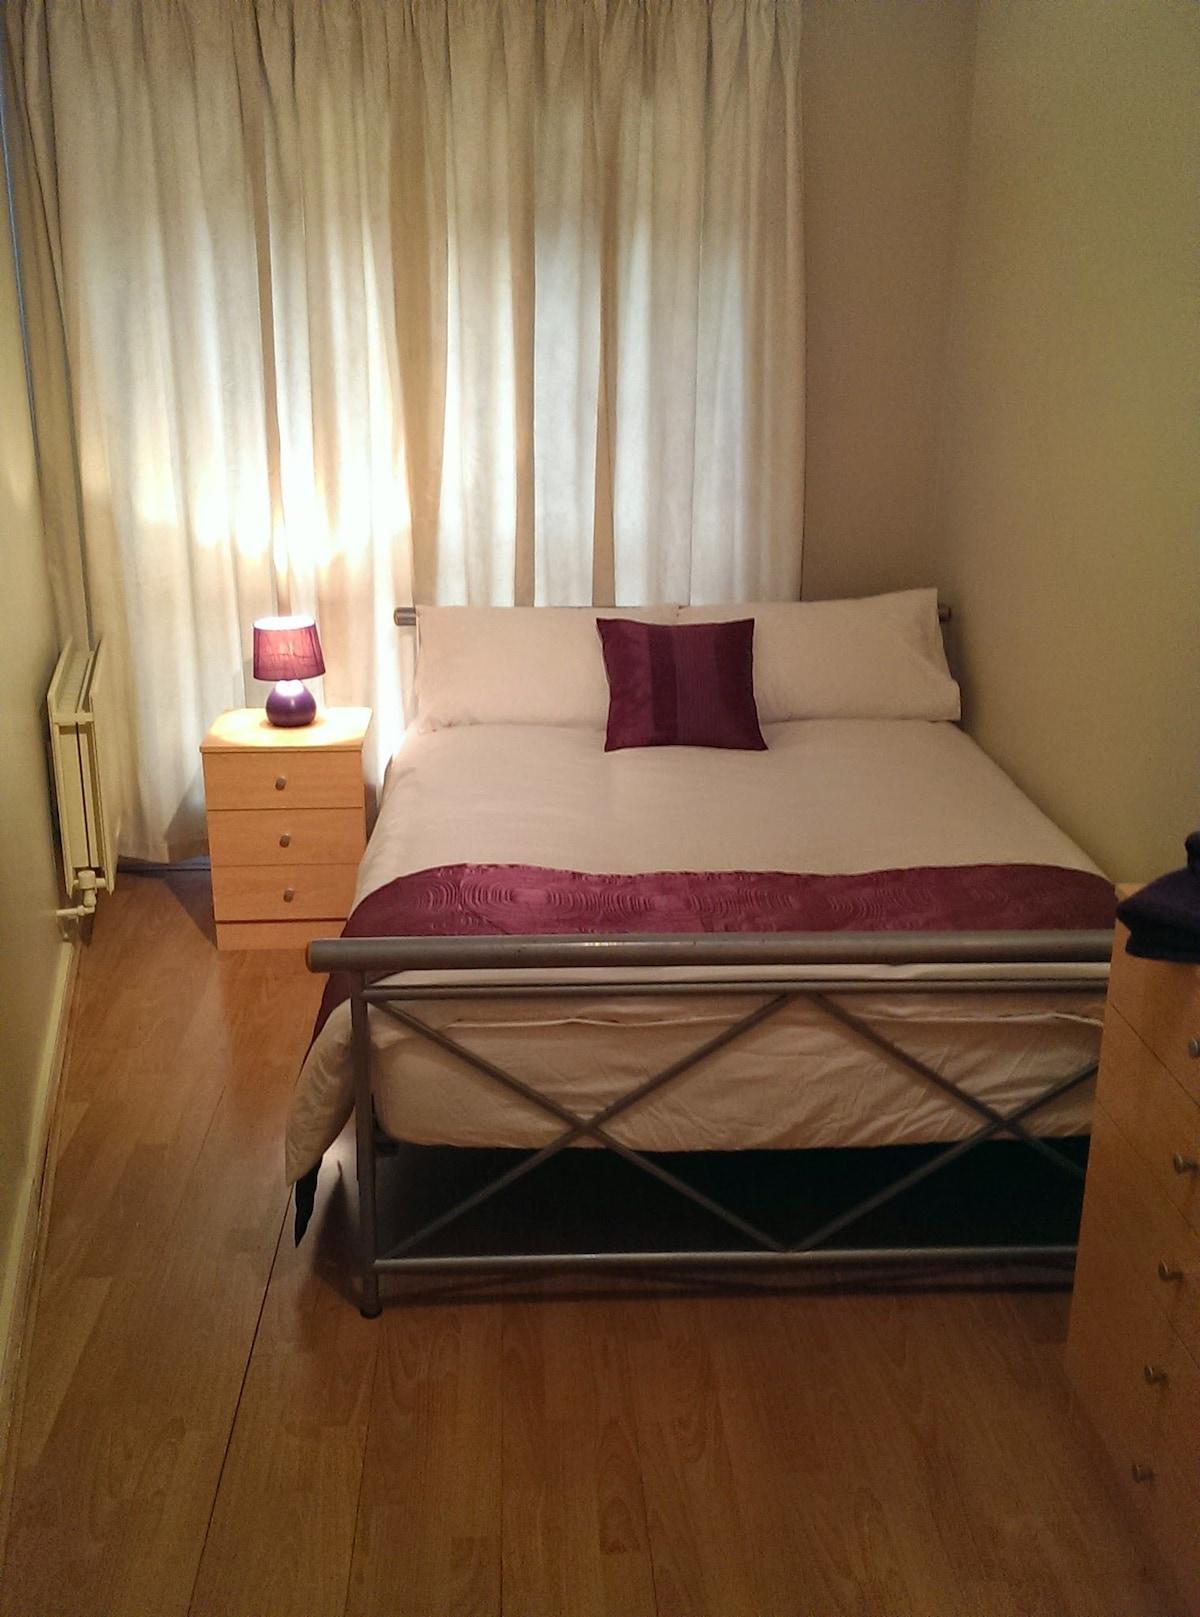 Bedroom with plenty of space